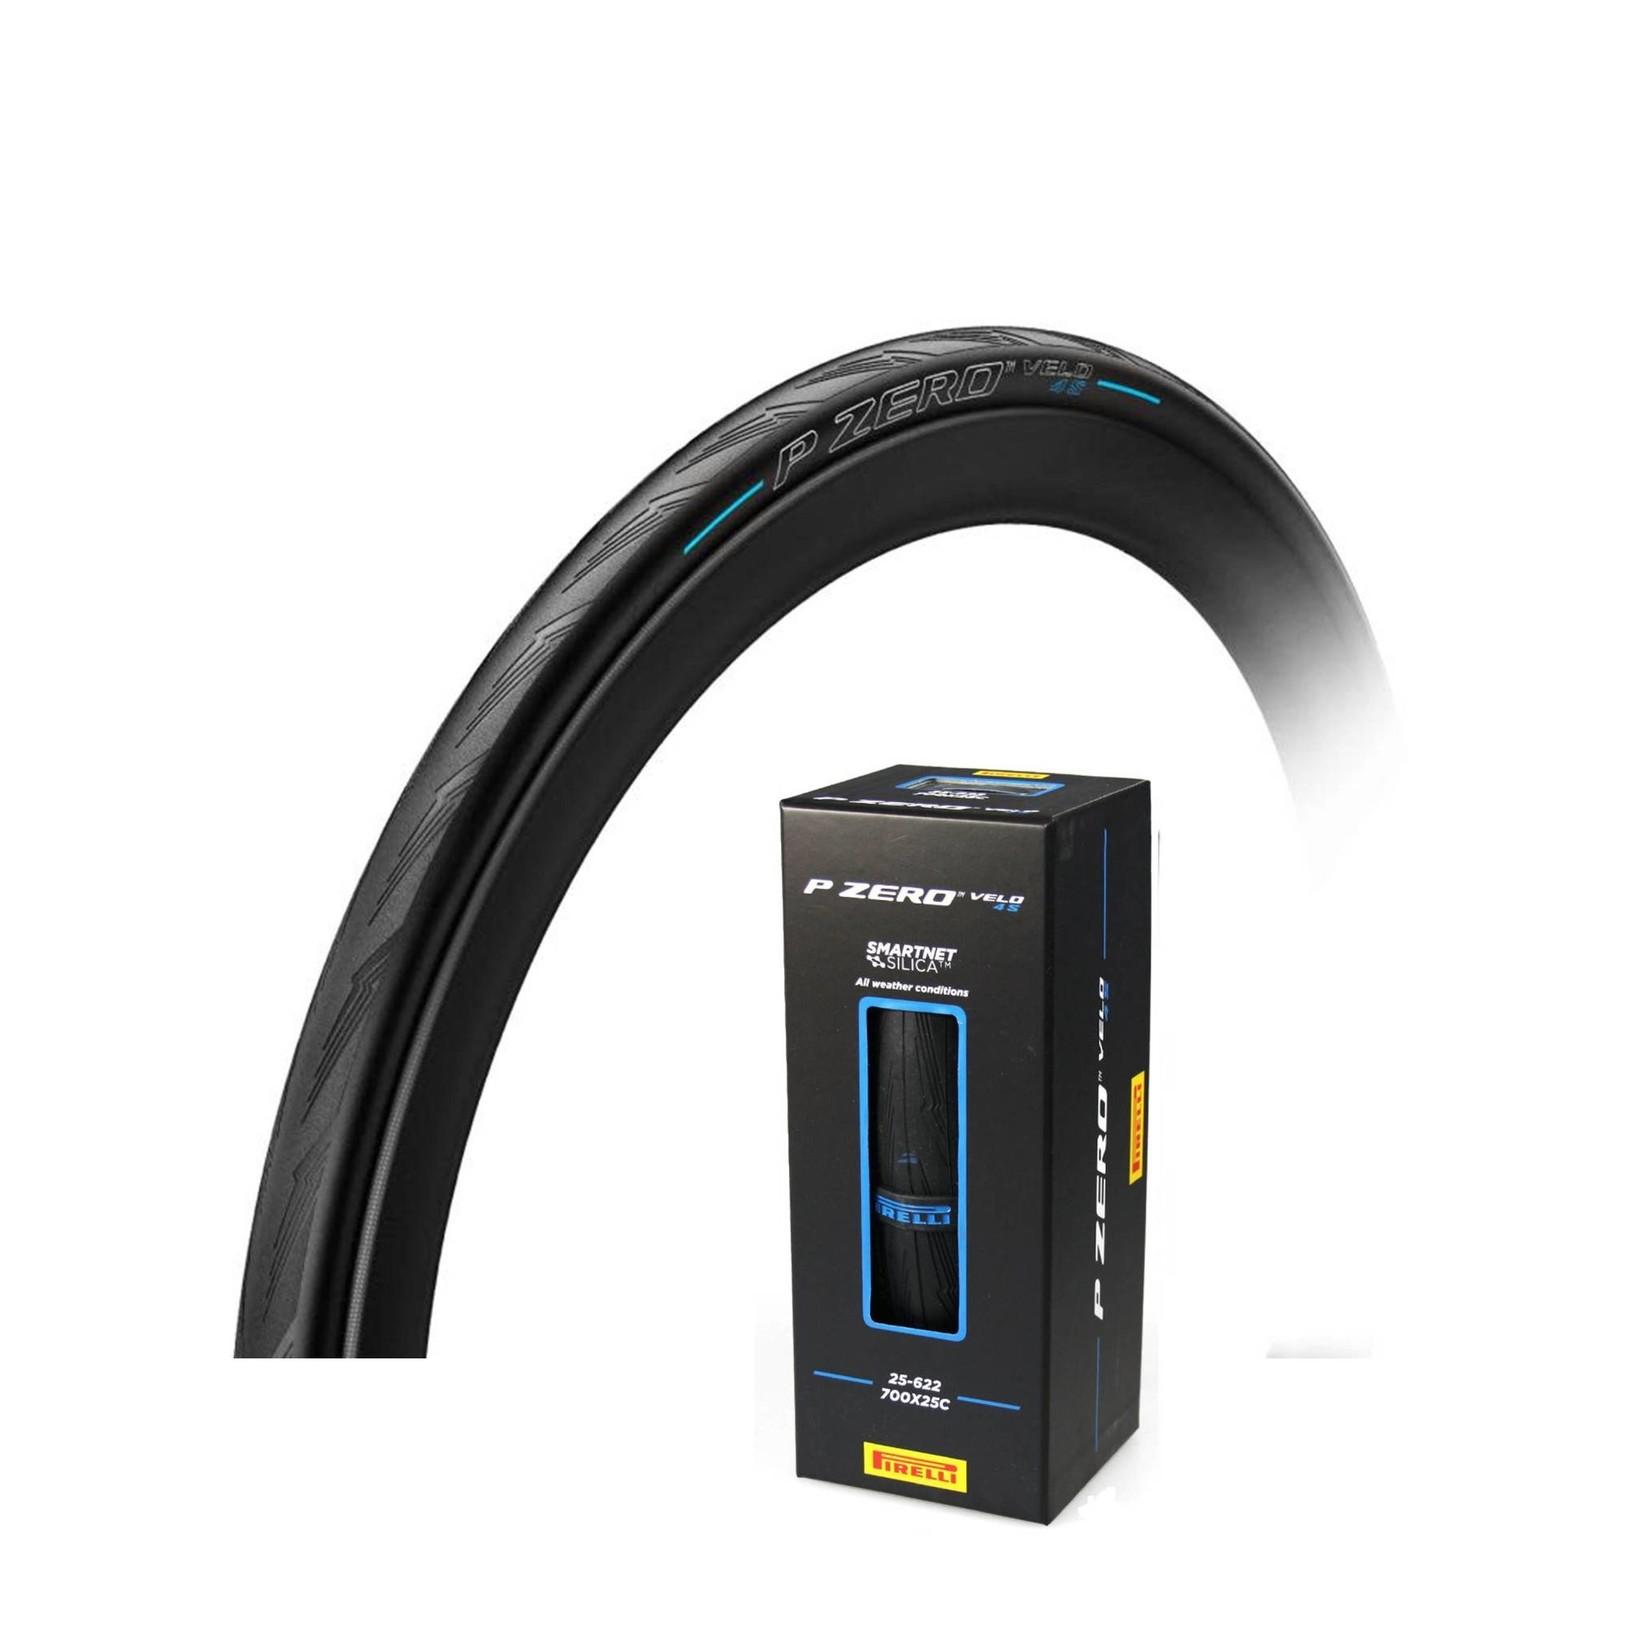 Pirelli Pzero Velo 4S Blue Tyre